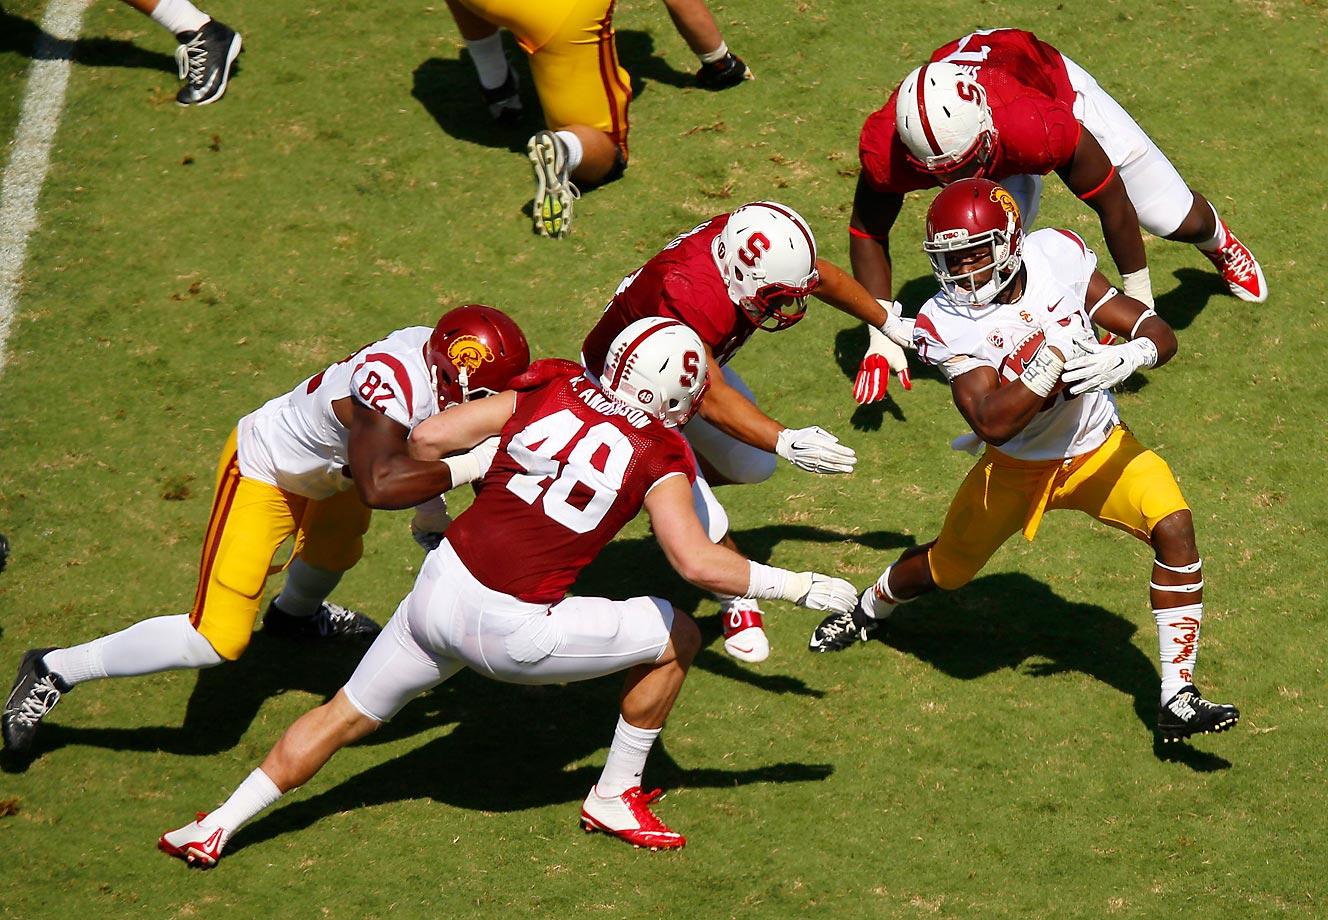 Javorius Allen escapes Stanford's defense on this run.  USC won 13-10.